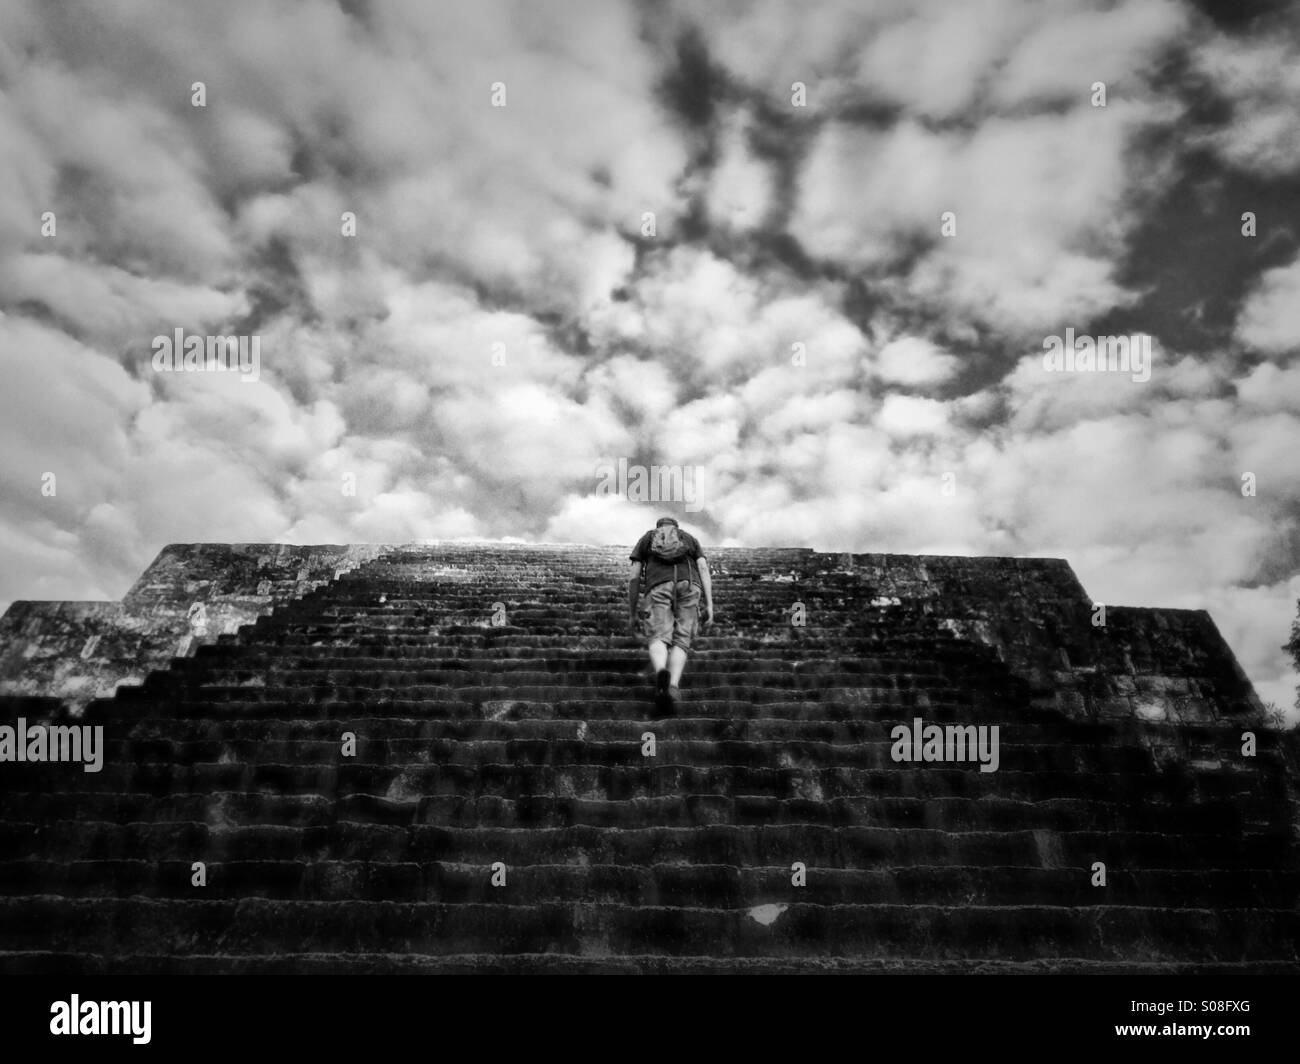 Mann Klettern Pyramide von Tikal, Guatemala Stockbild